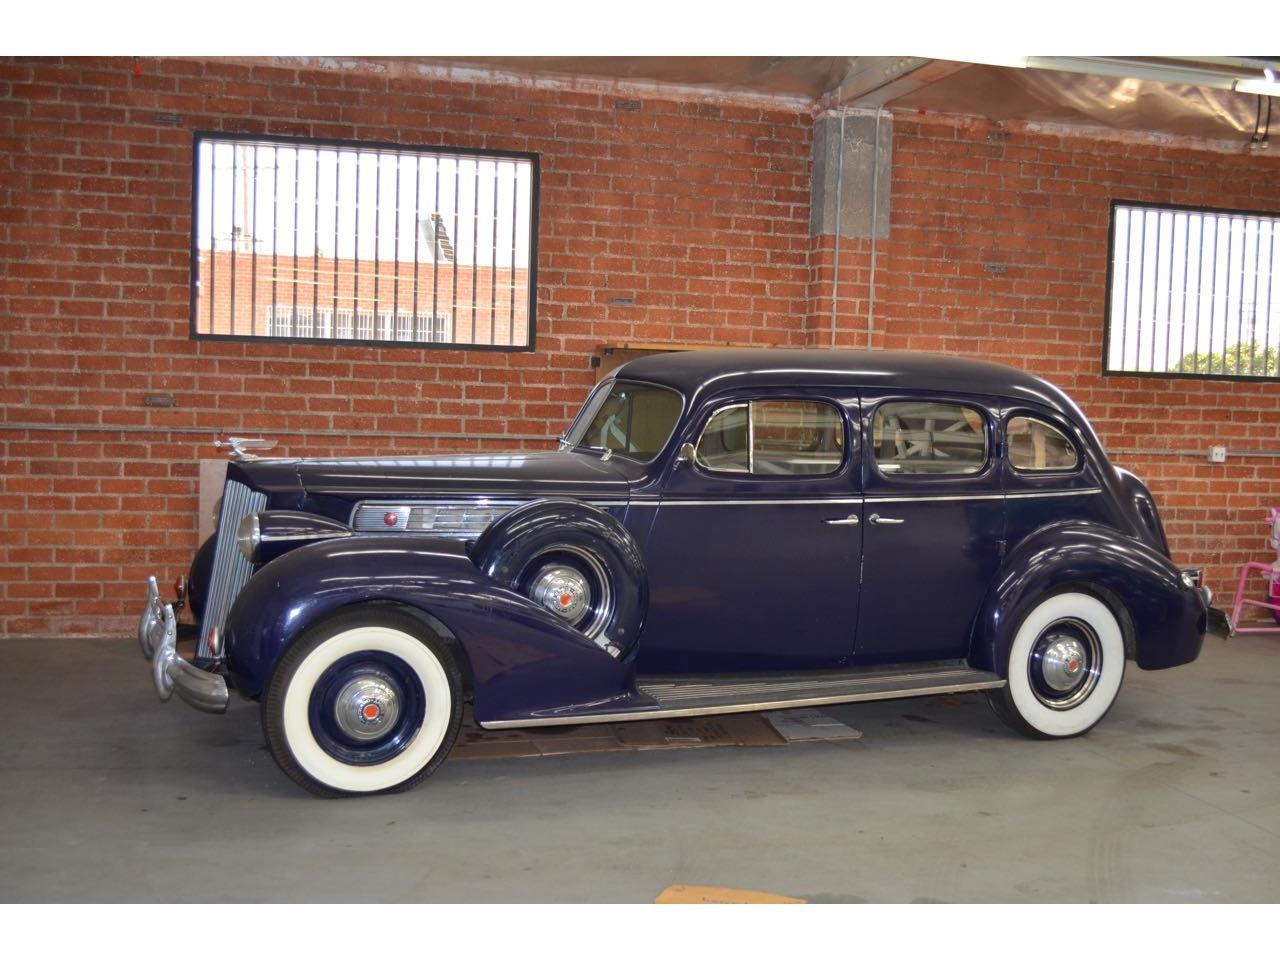 1939 Packard 1703 Super 8 Four Door Touring Sedan in Los Angeles, CA